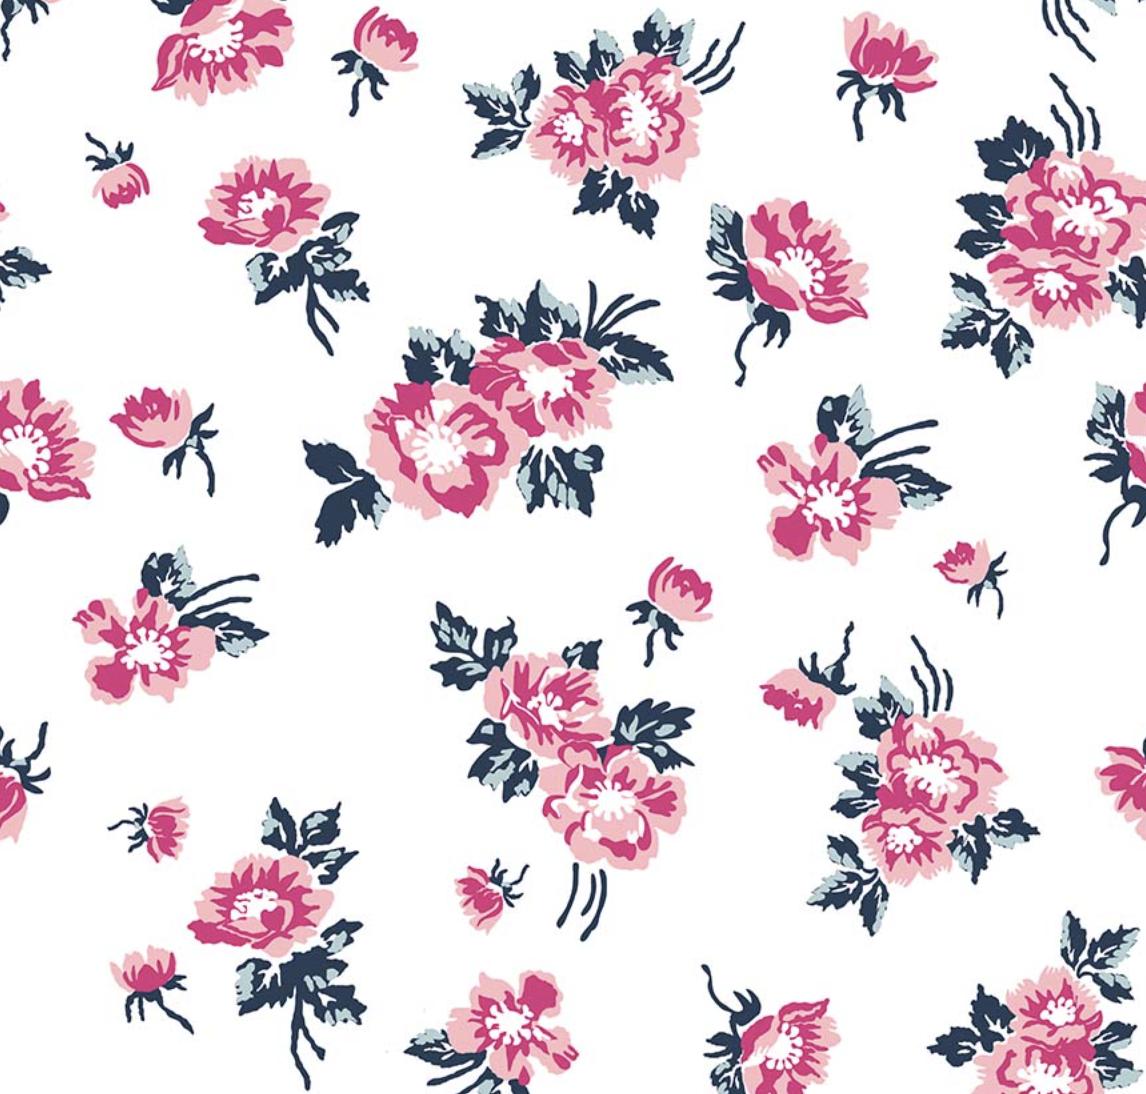 Riley Blake Designs - Melissa Mortenson - Derby Day - Floral - White